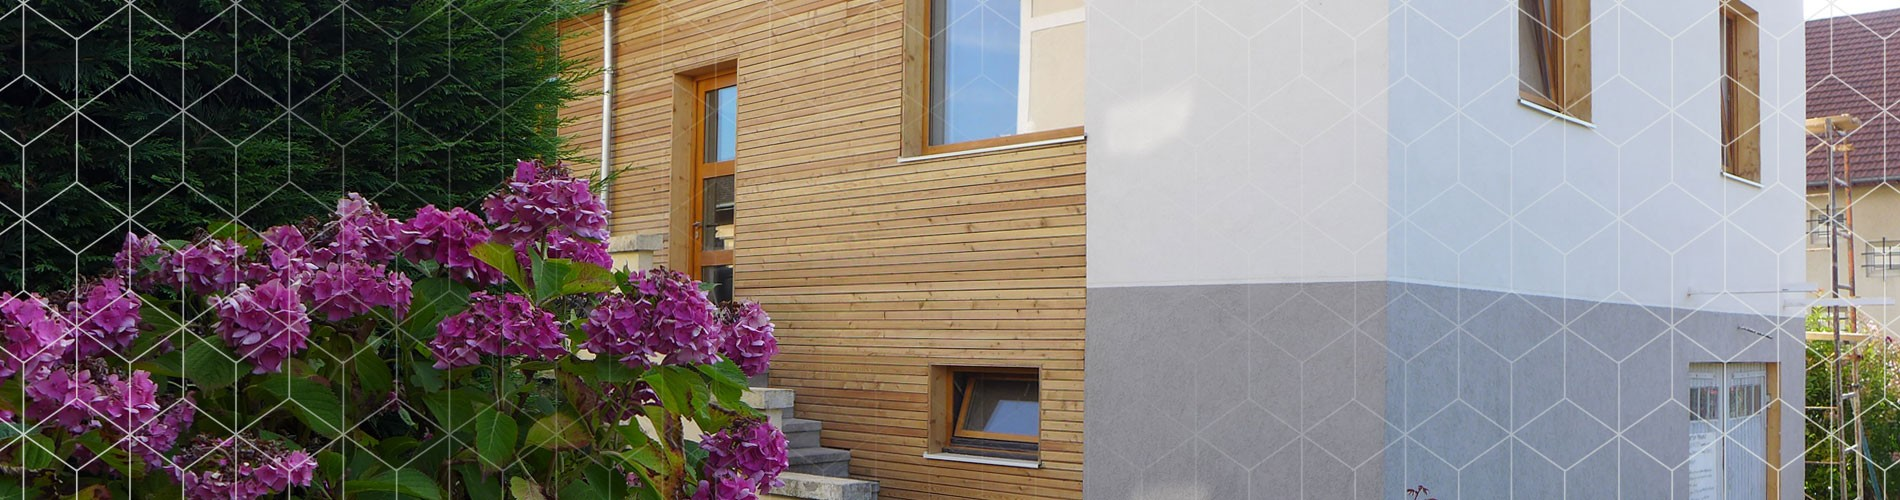 asb architecte architecture chambery maison individuelle bois neuf contemporain